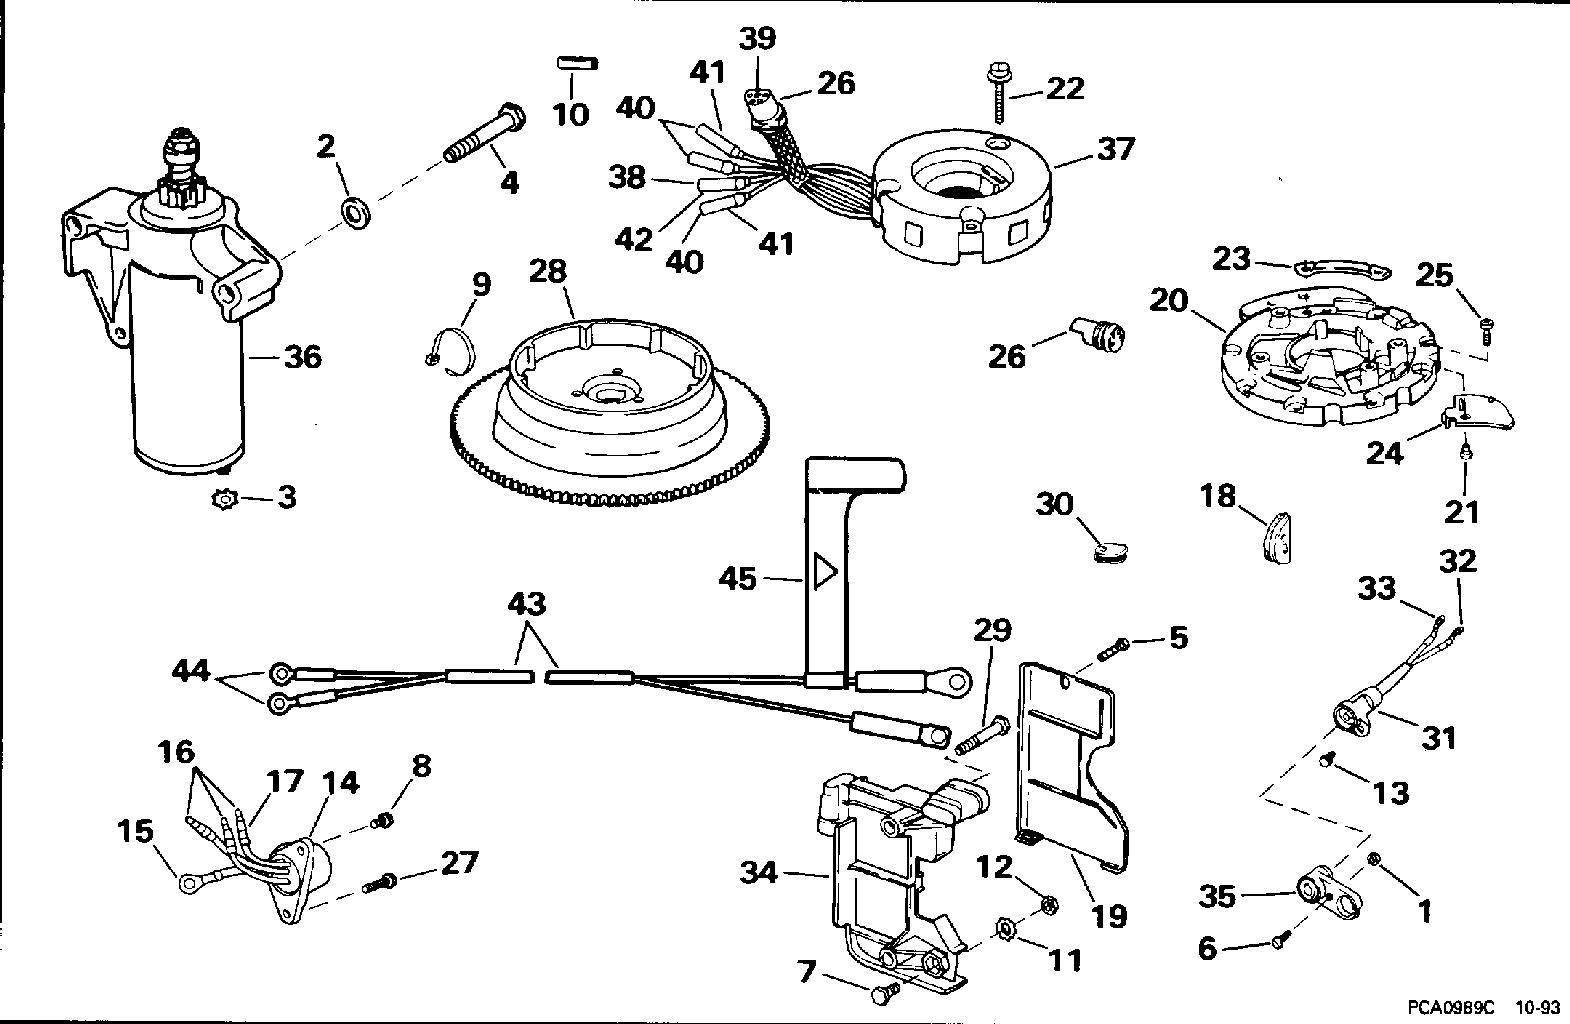 hight resolution of 1973 evinrude 65 hp wiring diagram imageresizertool com mercury 115 wiring diagram 2 2 1976 evinrude 115 wiring diagram